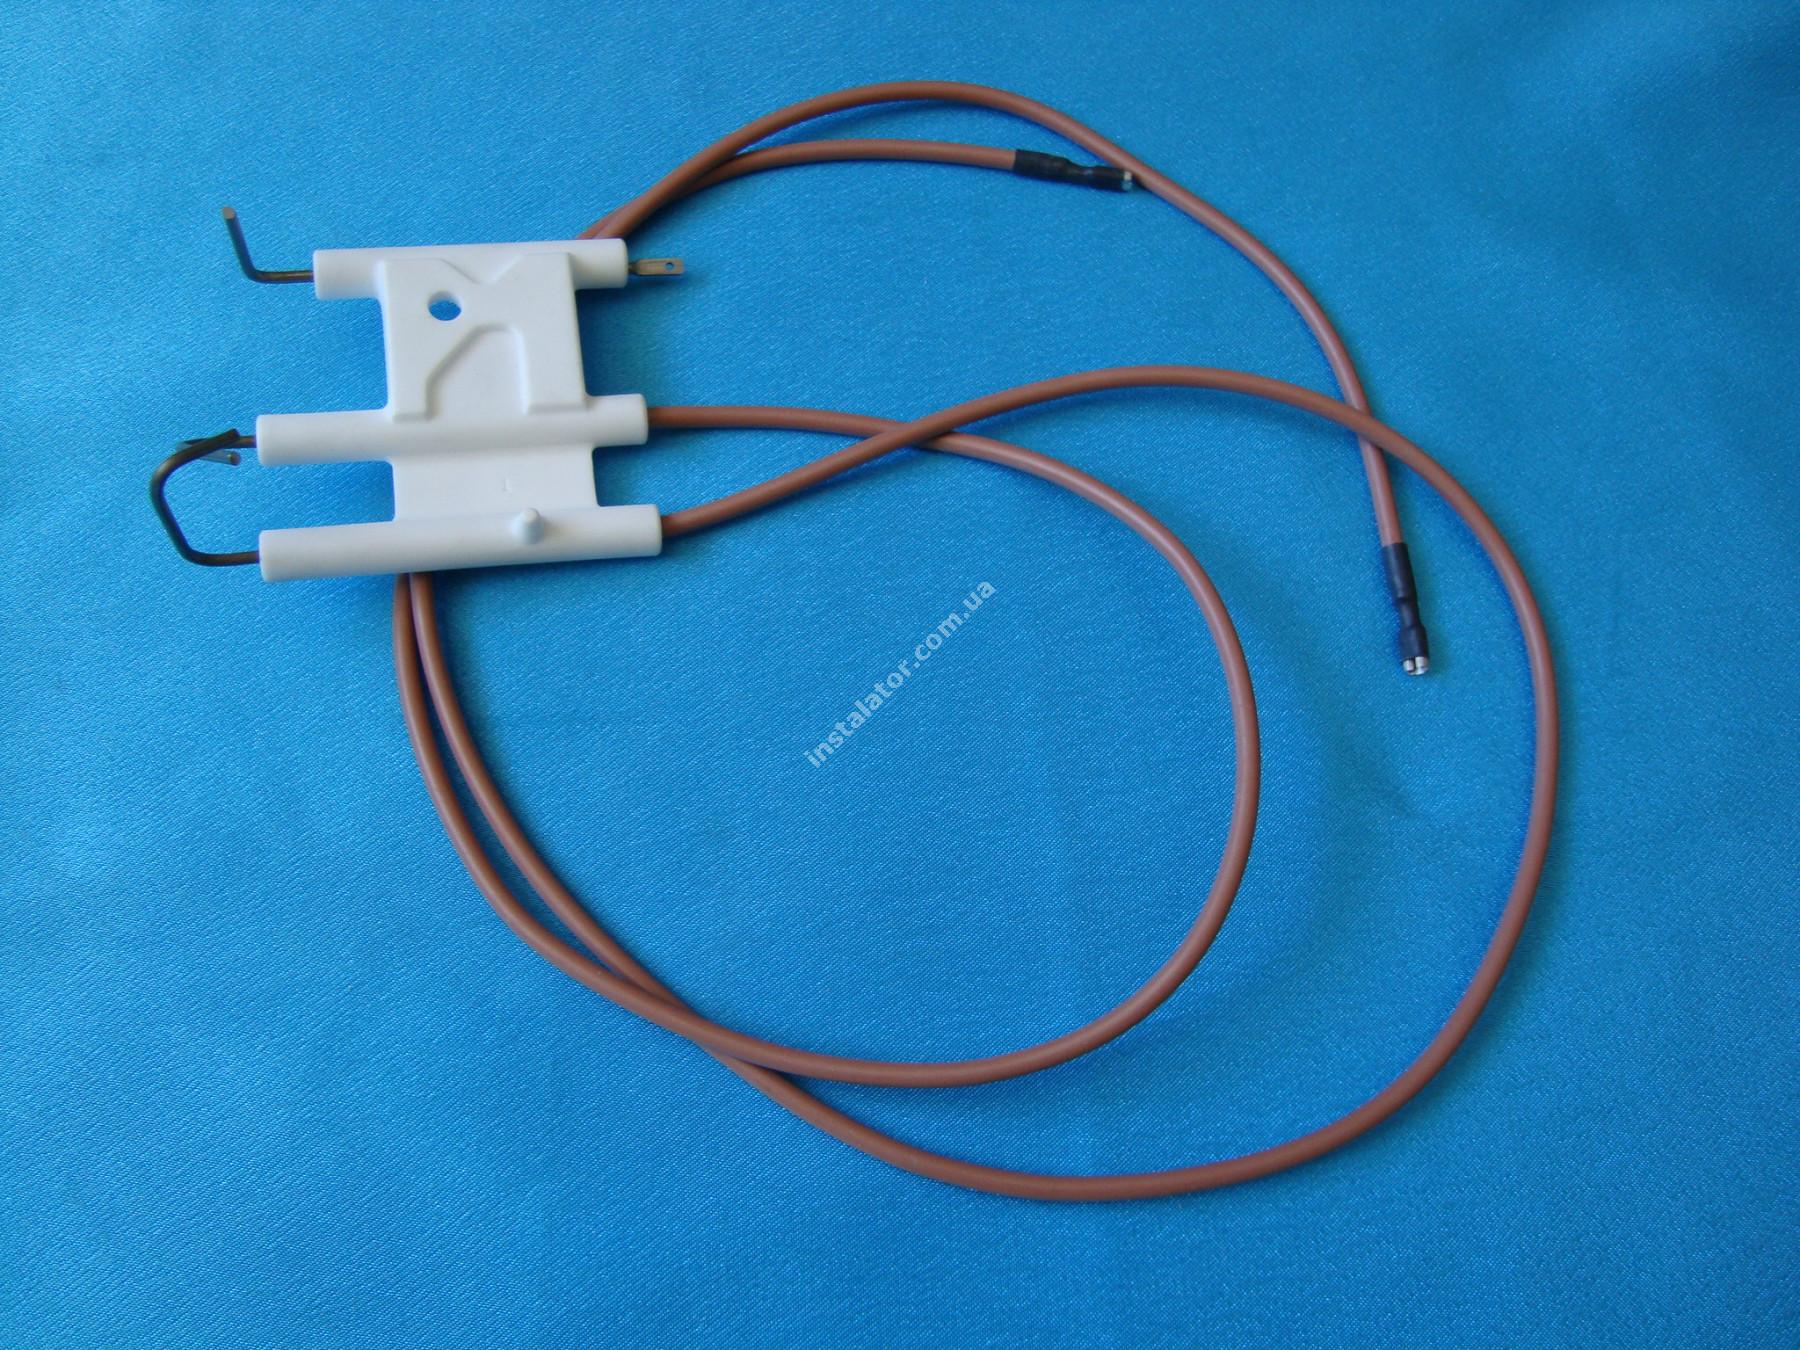 0020039057 Група електродів  VAILLANT atmoTec, turboTec Pro\Plus   full-image-0